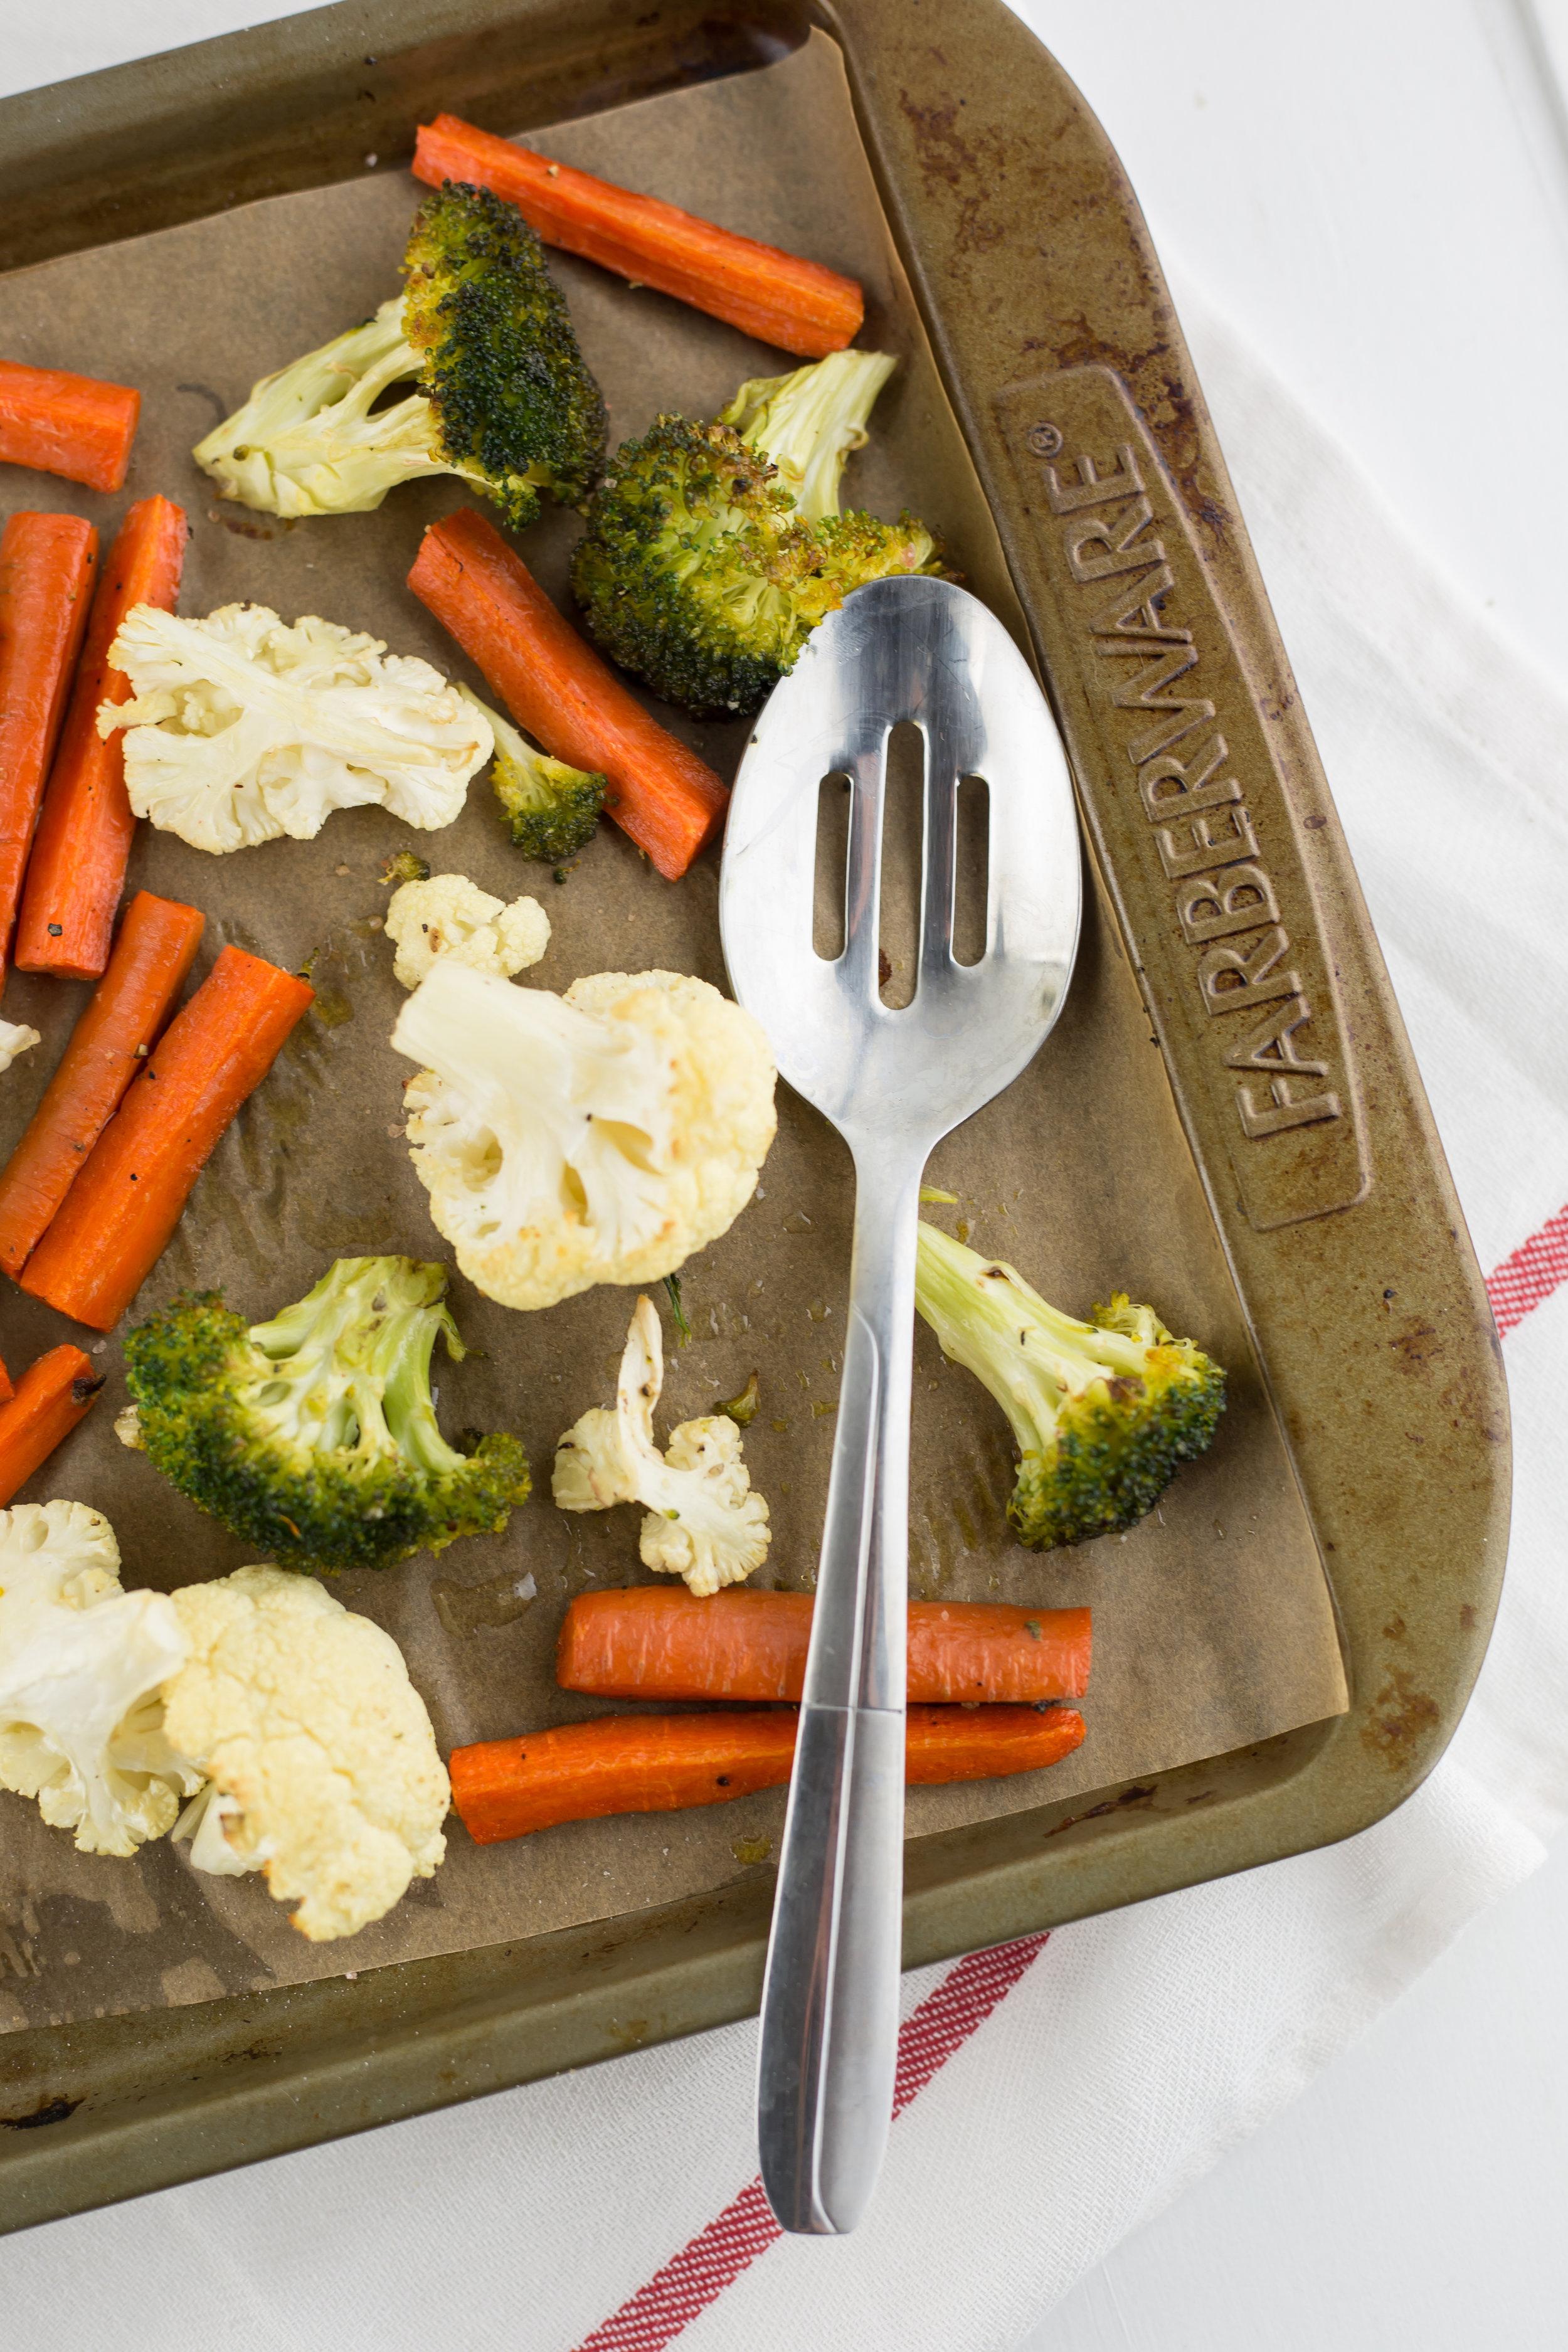 Cauliflower, Broccoli, Carrots, Healthy, Healthy Fats, Ghee, Paleo, Primal, Whole30